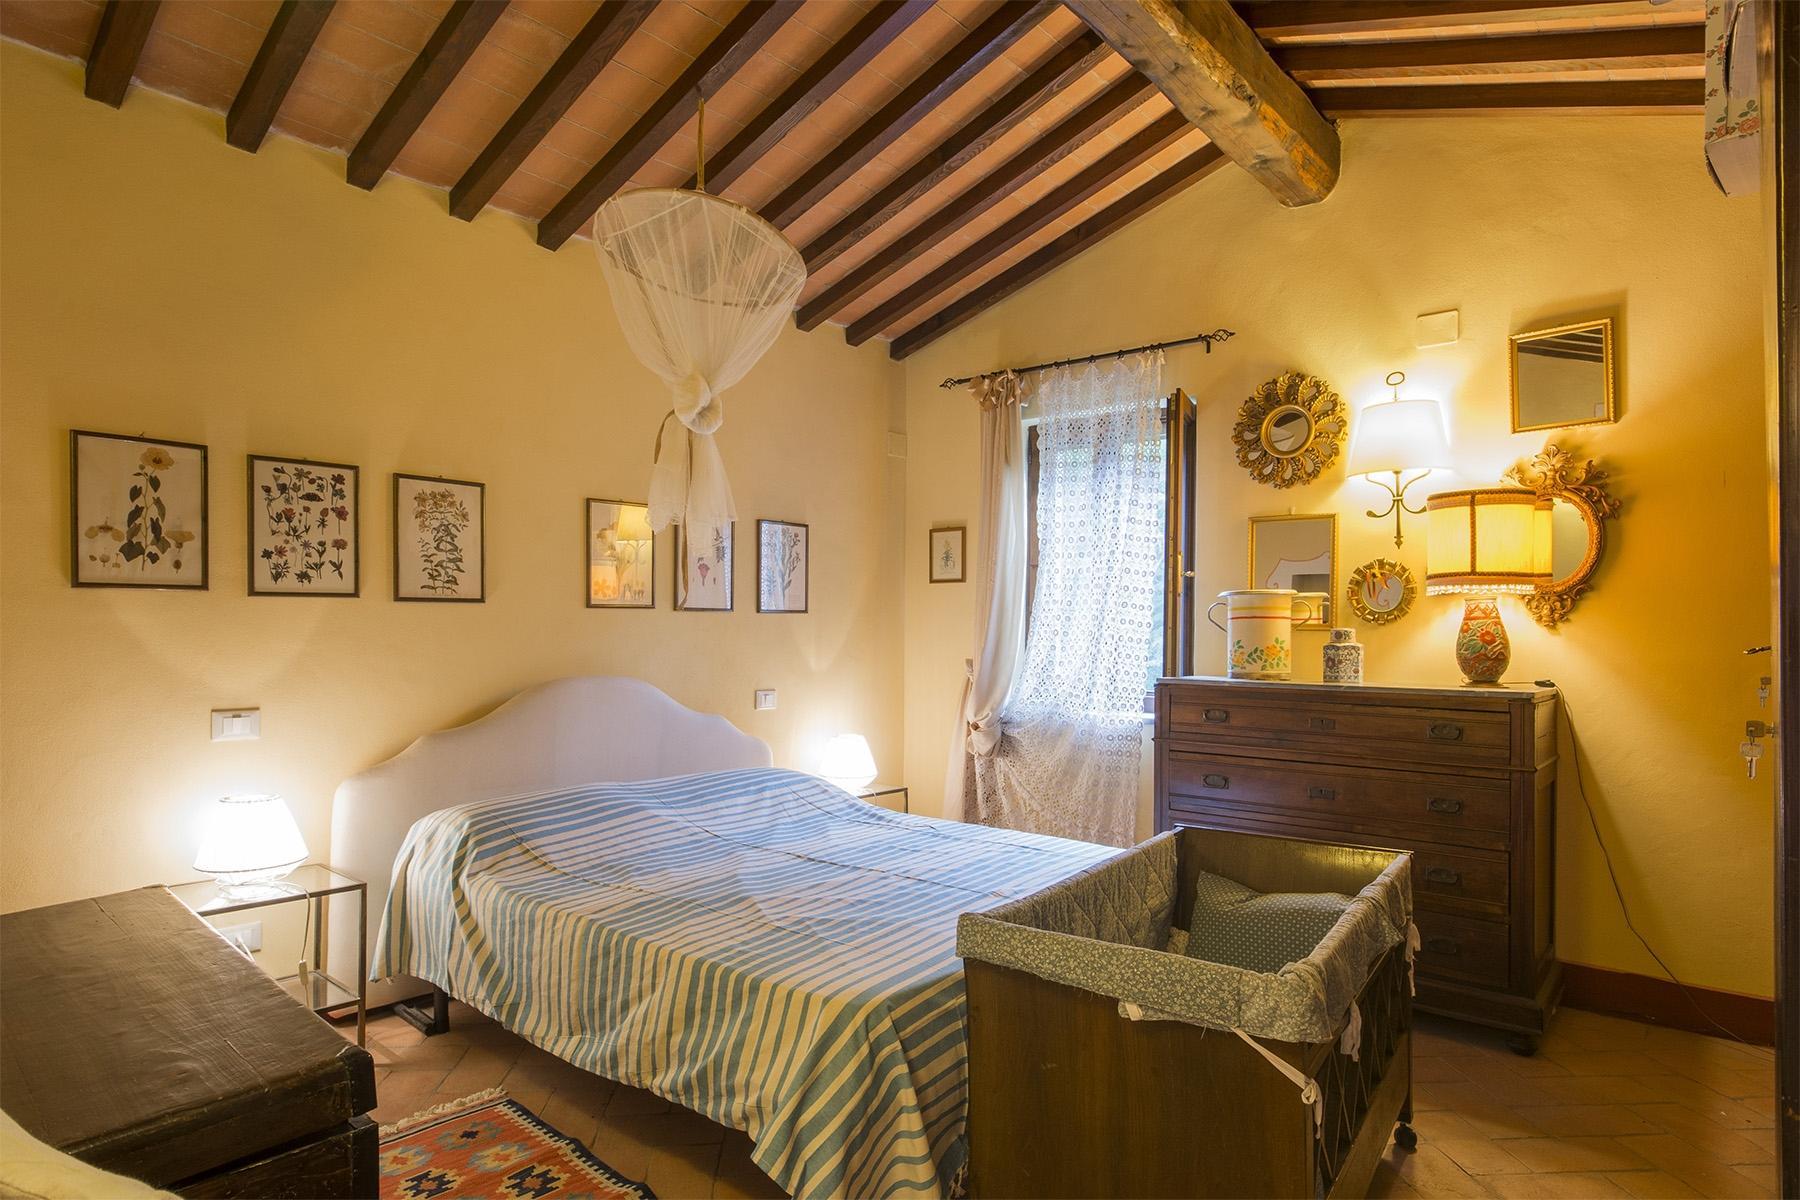 Superb property on the hills of Pisa - 12